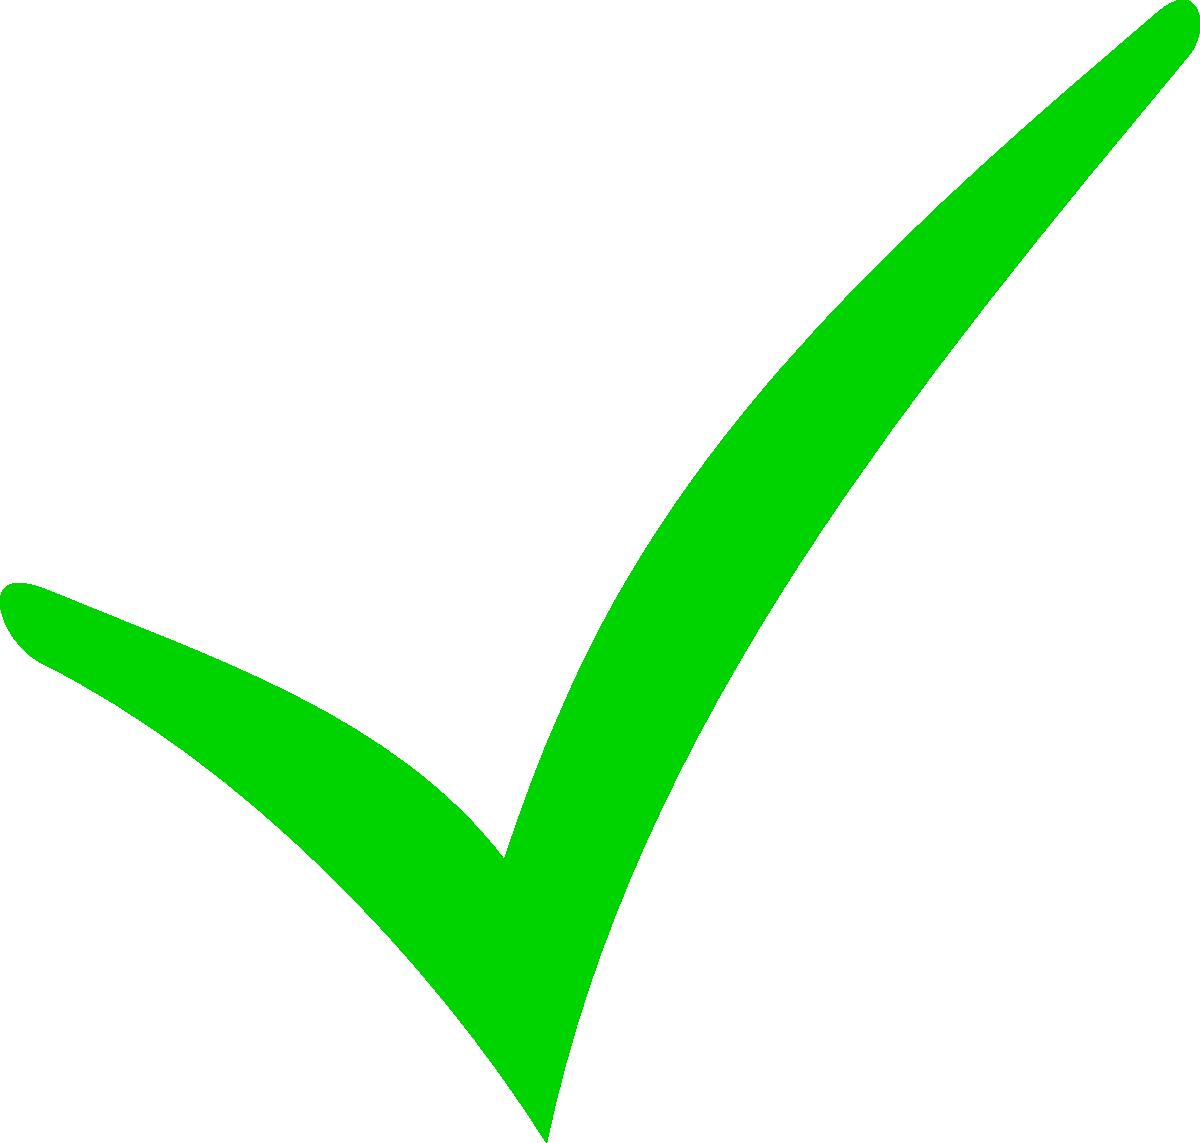 Free Green Tick Mark, Download Free Clip Art, Free Clip Art.